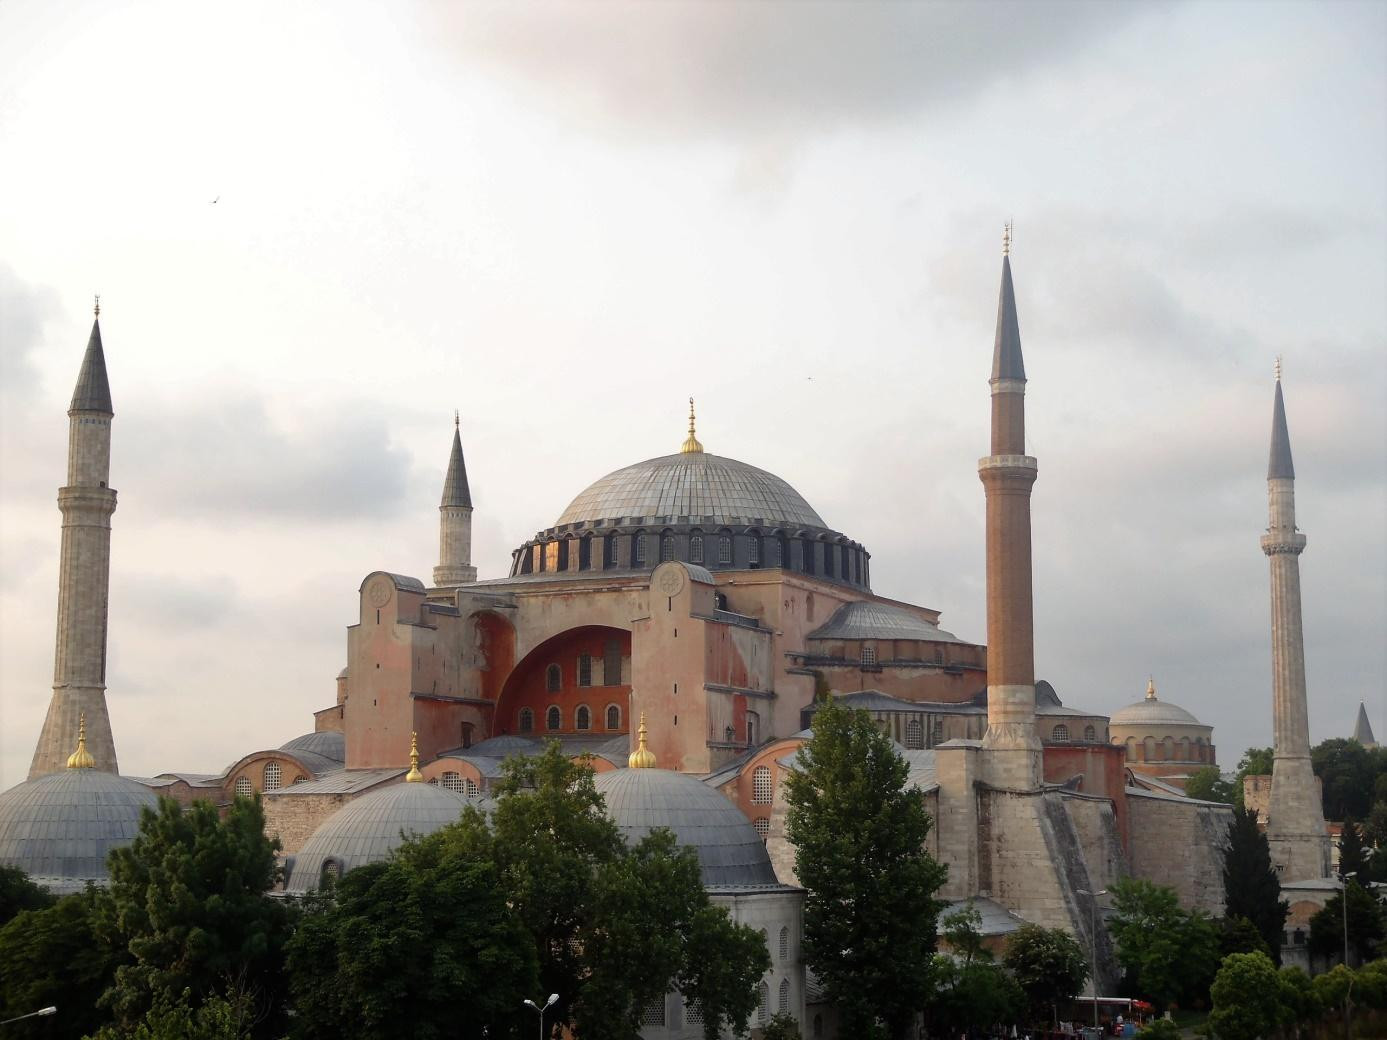 C:\Users\Administrator\Documents\Documents\Putovanja\PUTOPISI\TURSKA\2\Slike\9.jpg